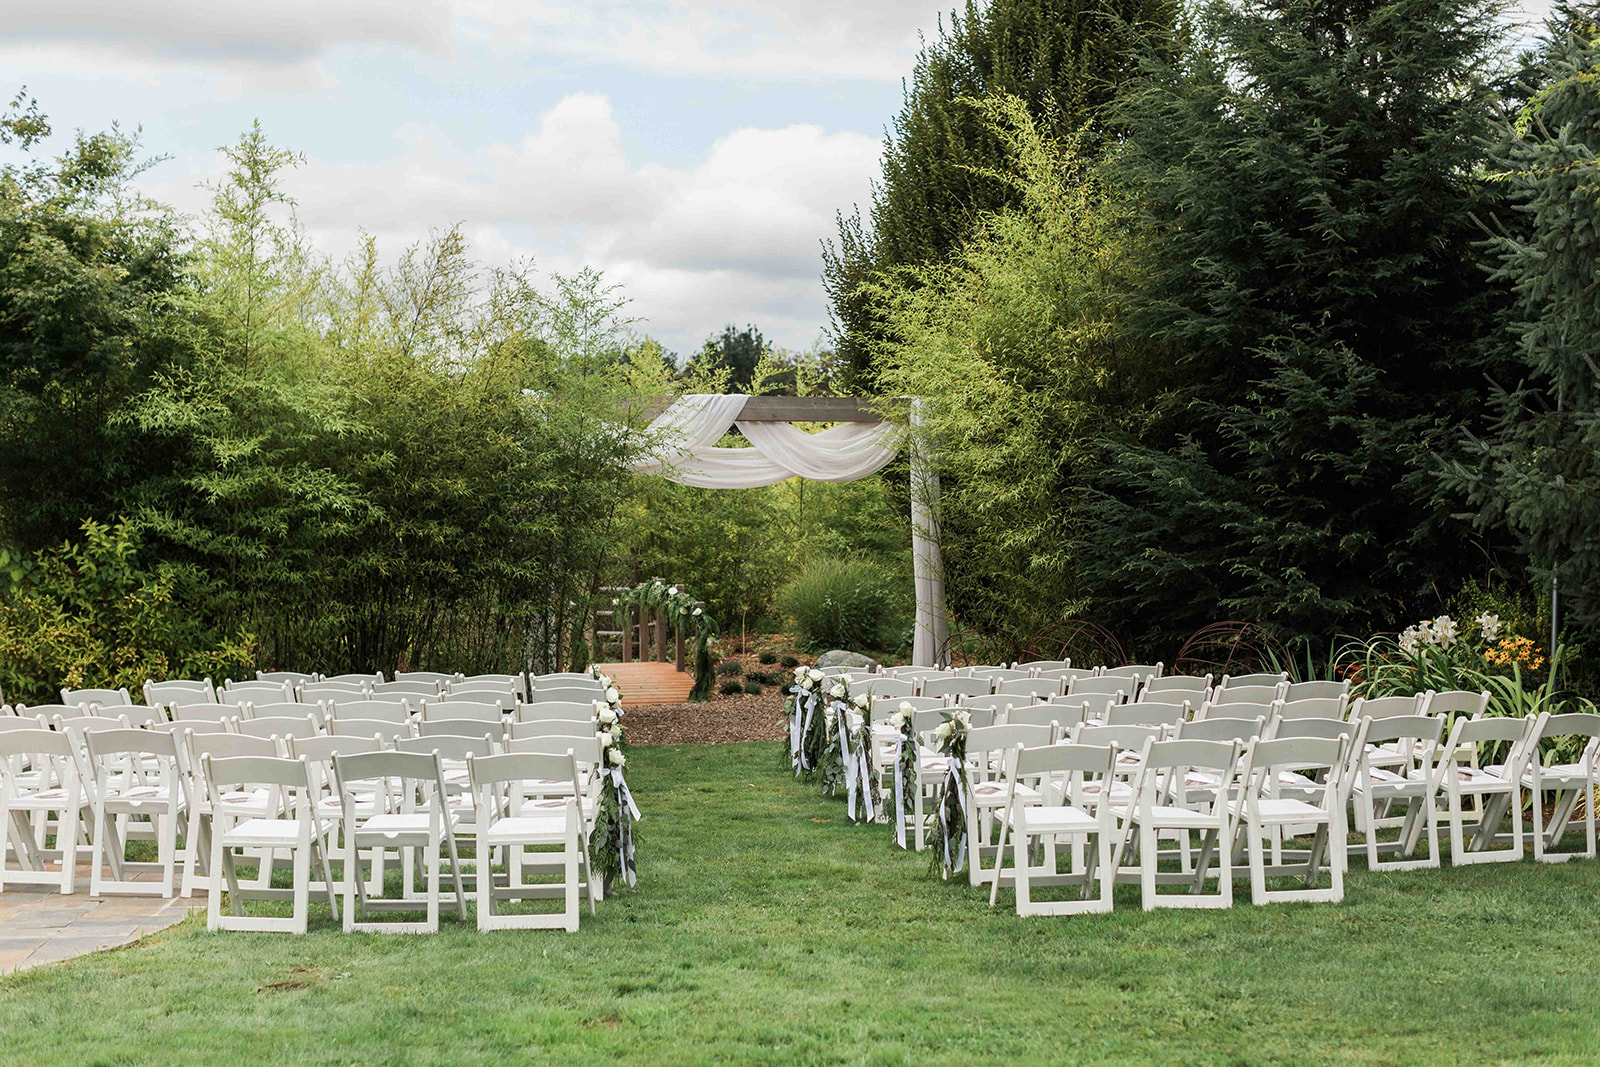 Glen___Ace_Wedding_Joanna_Monger_Photography_Falling_Water_Gardens_Monroe-23